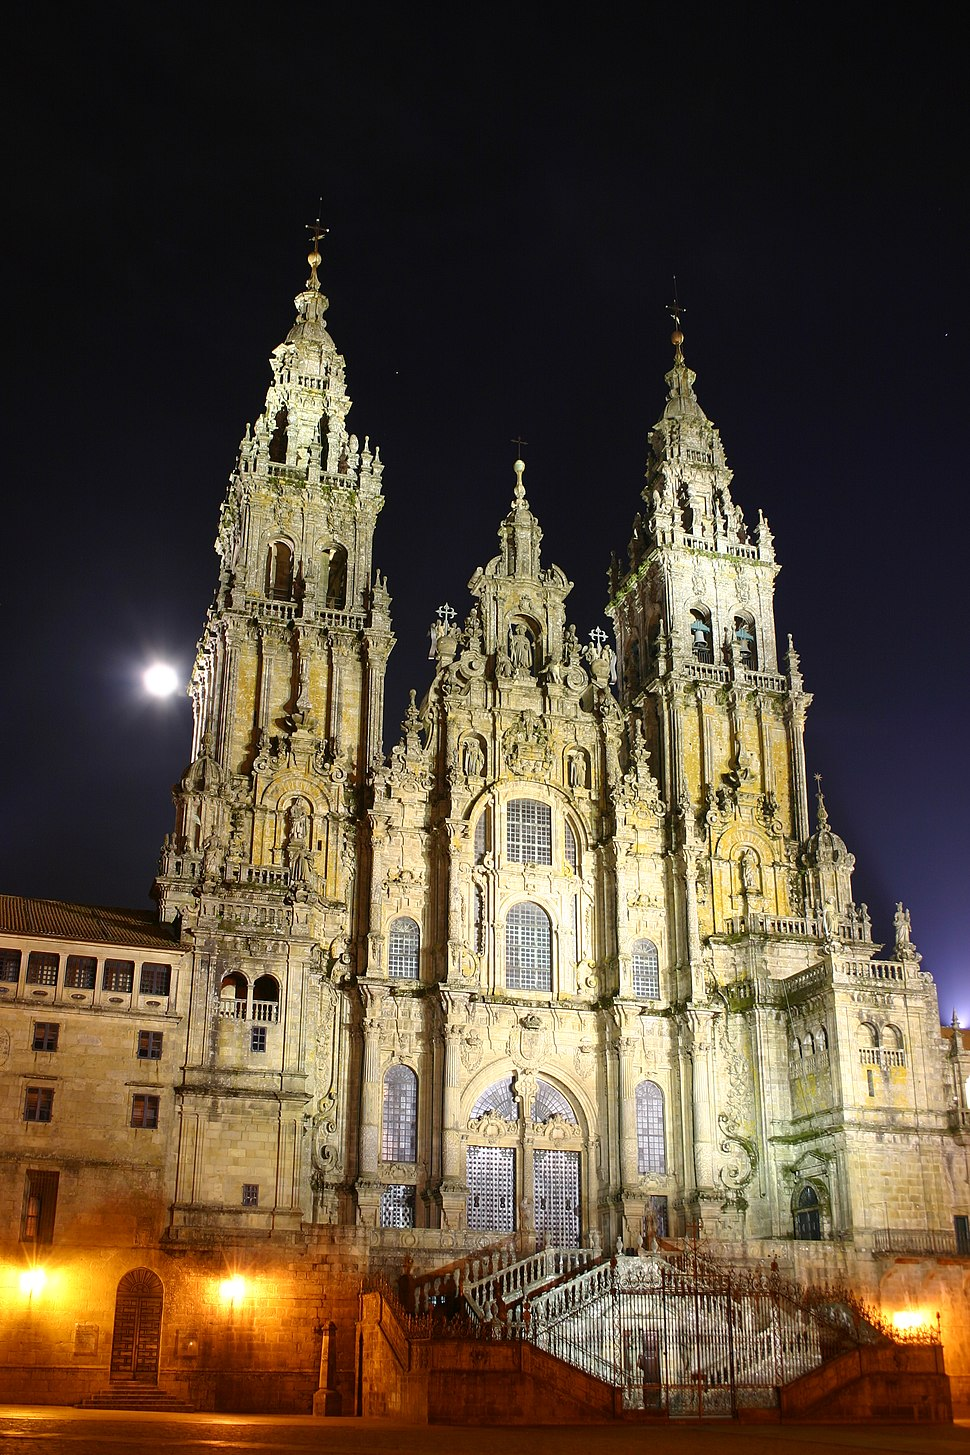 A Catedral durante a noite.